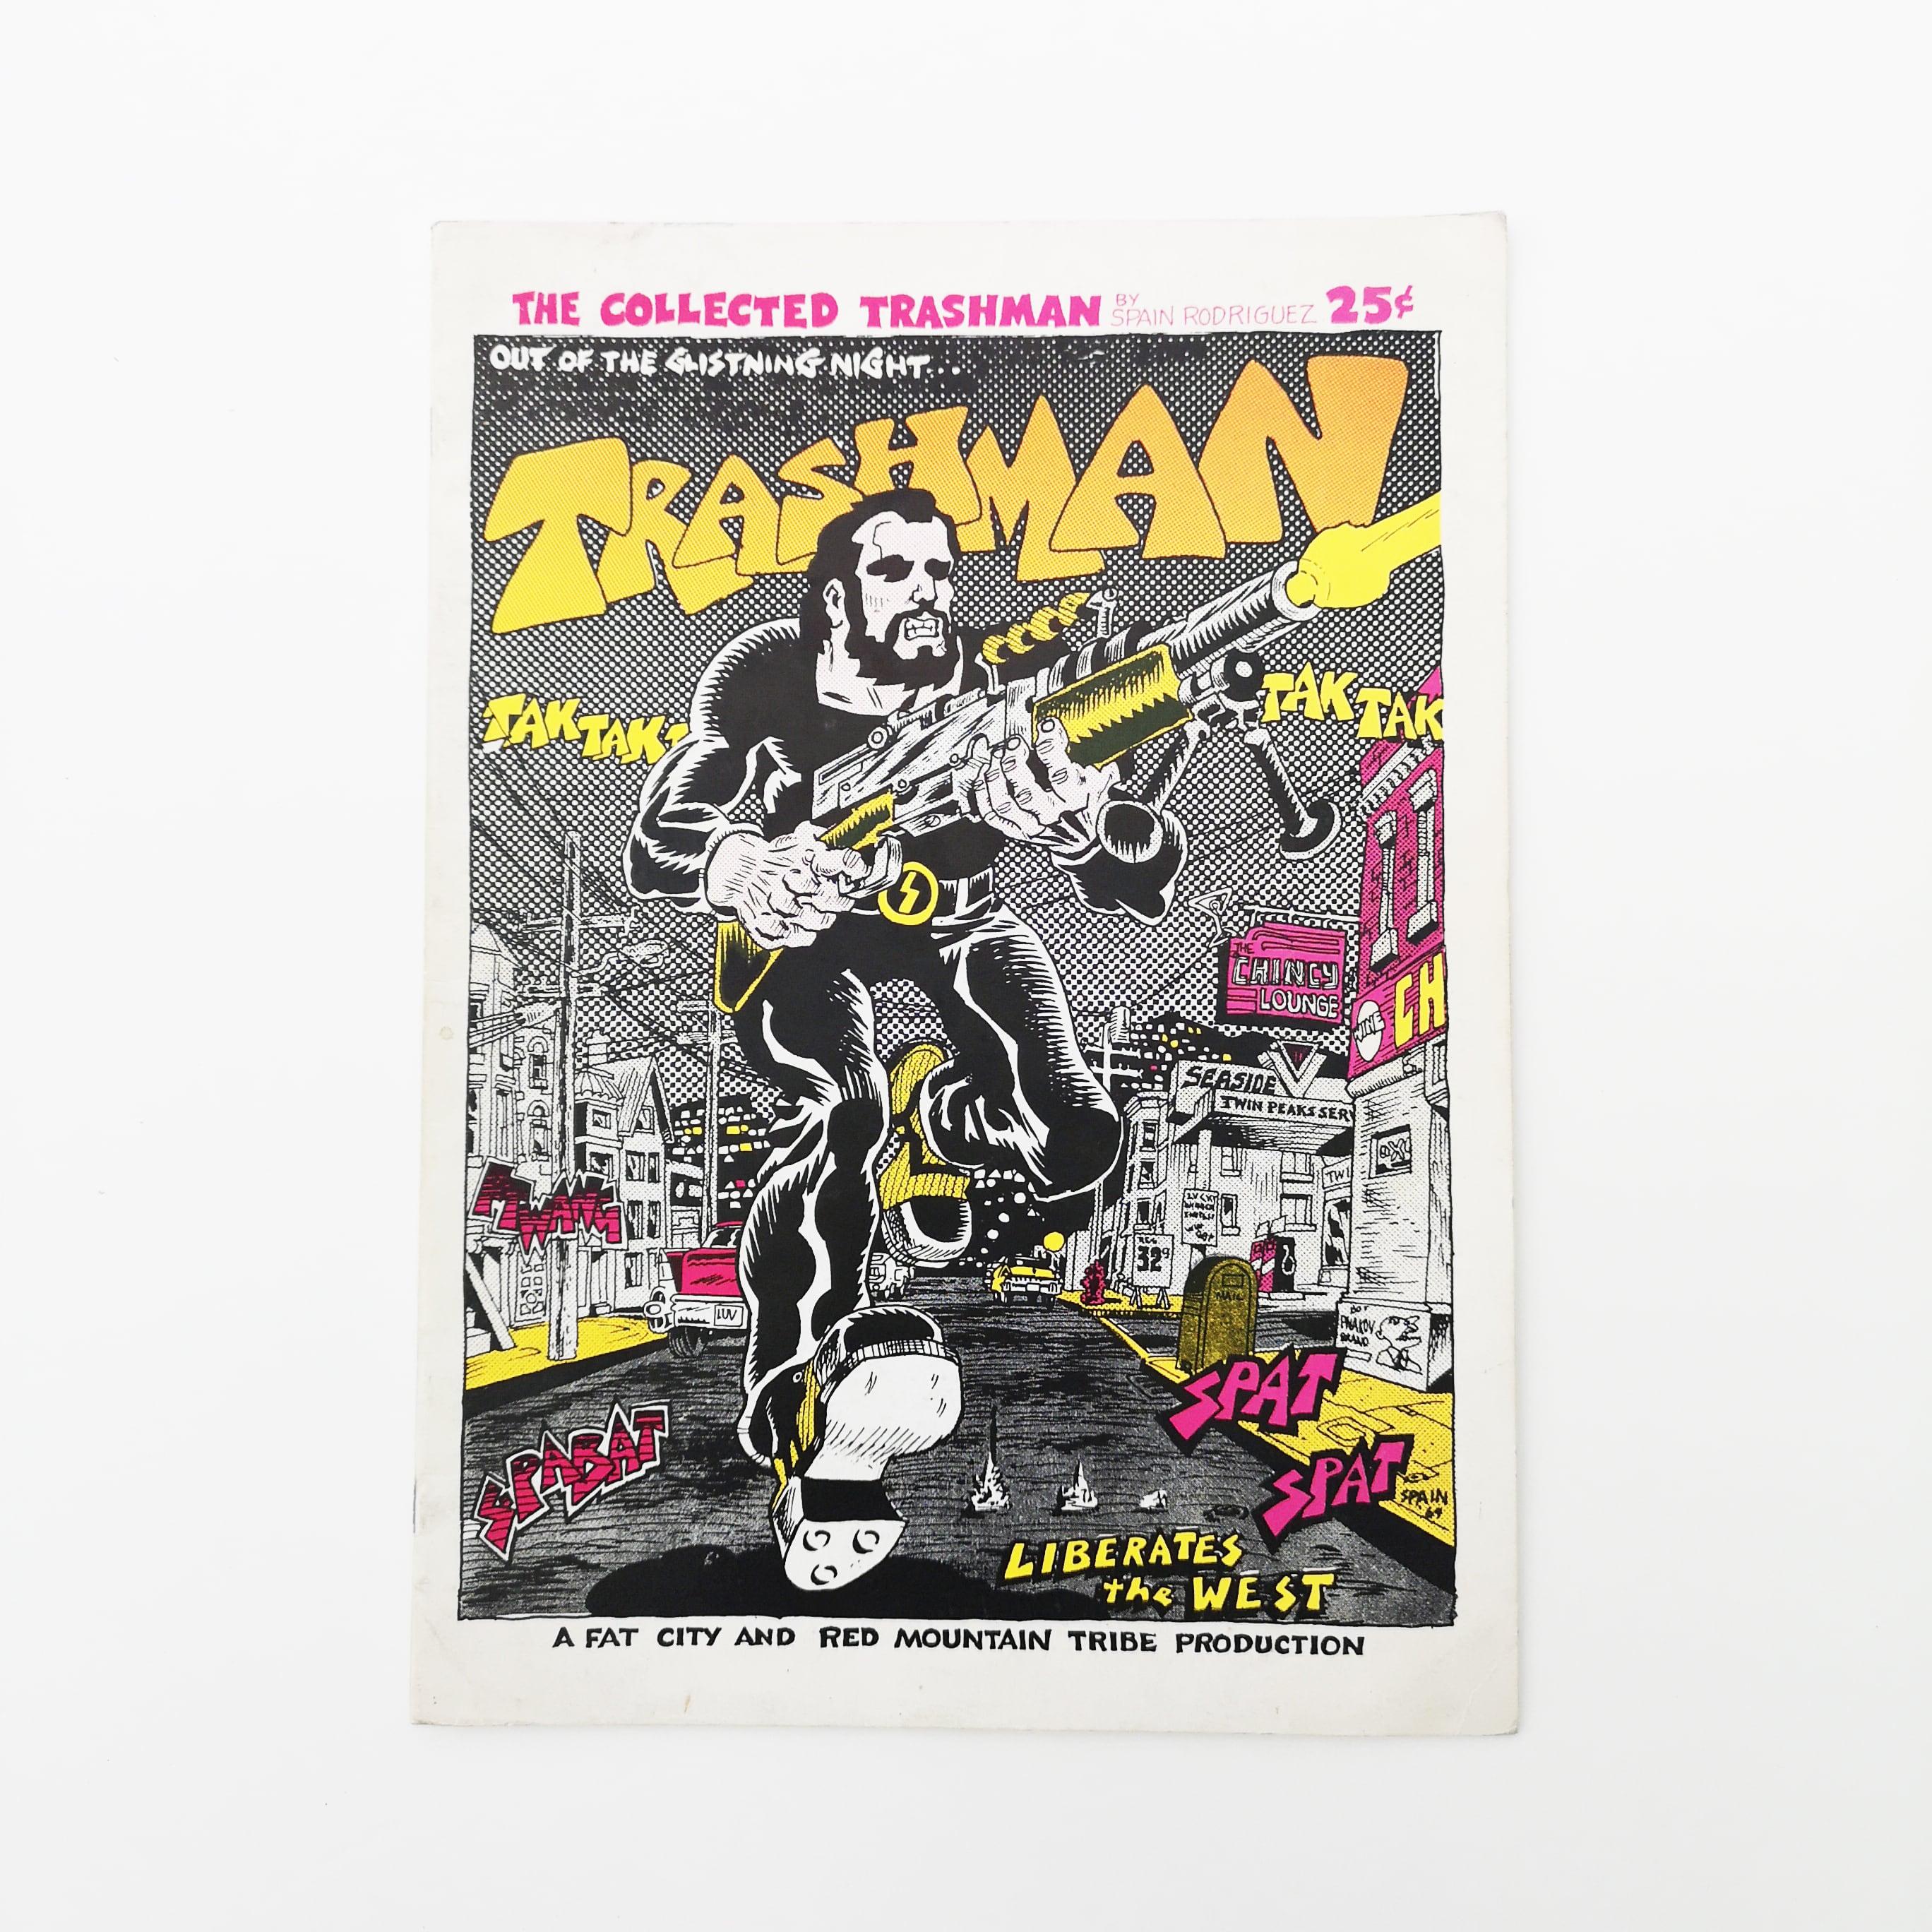 TRASHMAN (VINTAGE COMIC) by SPAIN RODRIGUES